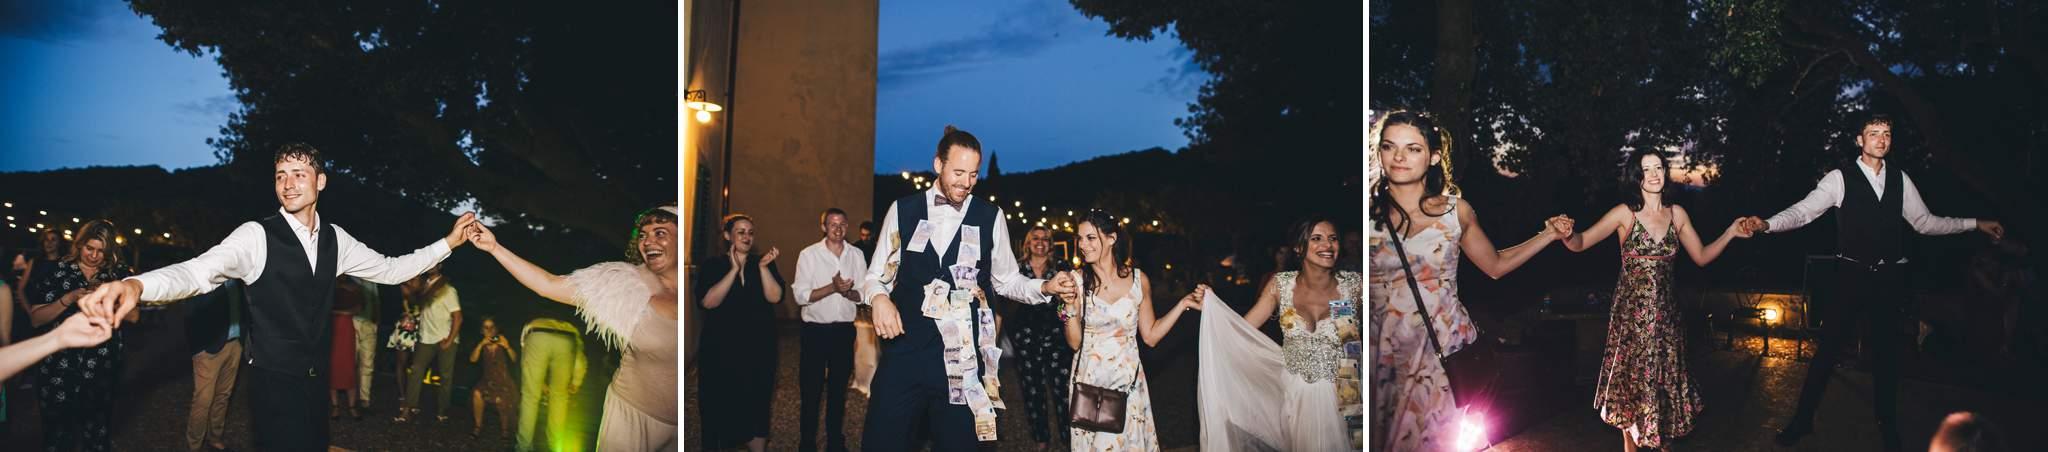 39wedding-photographer-villa-petrolo